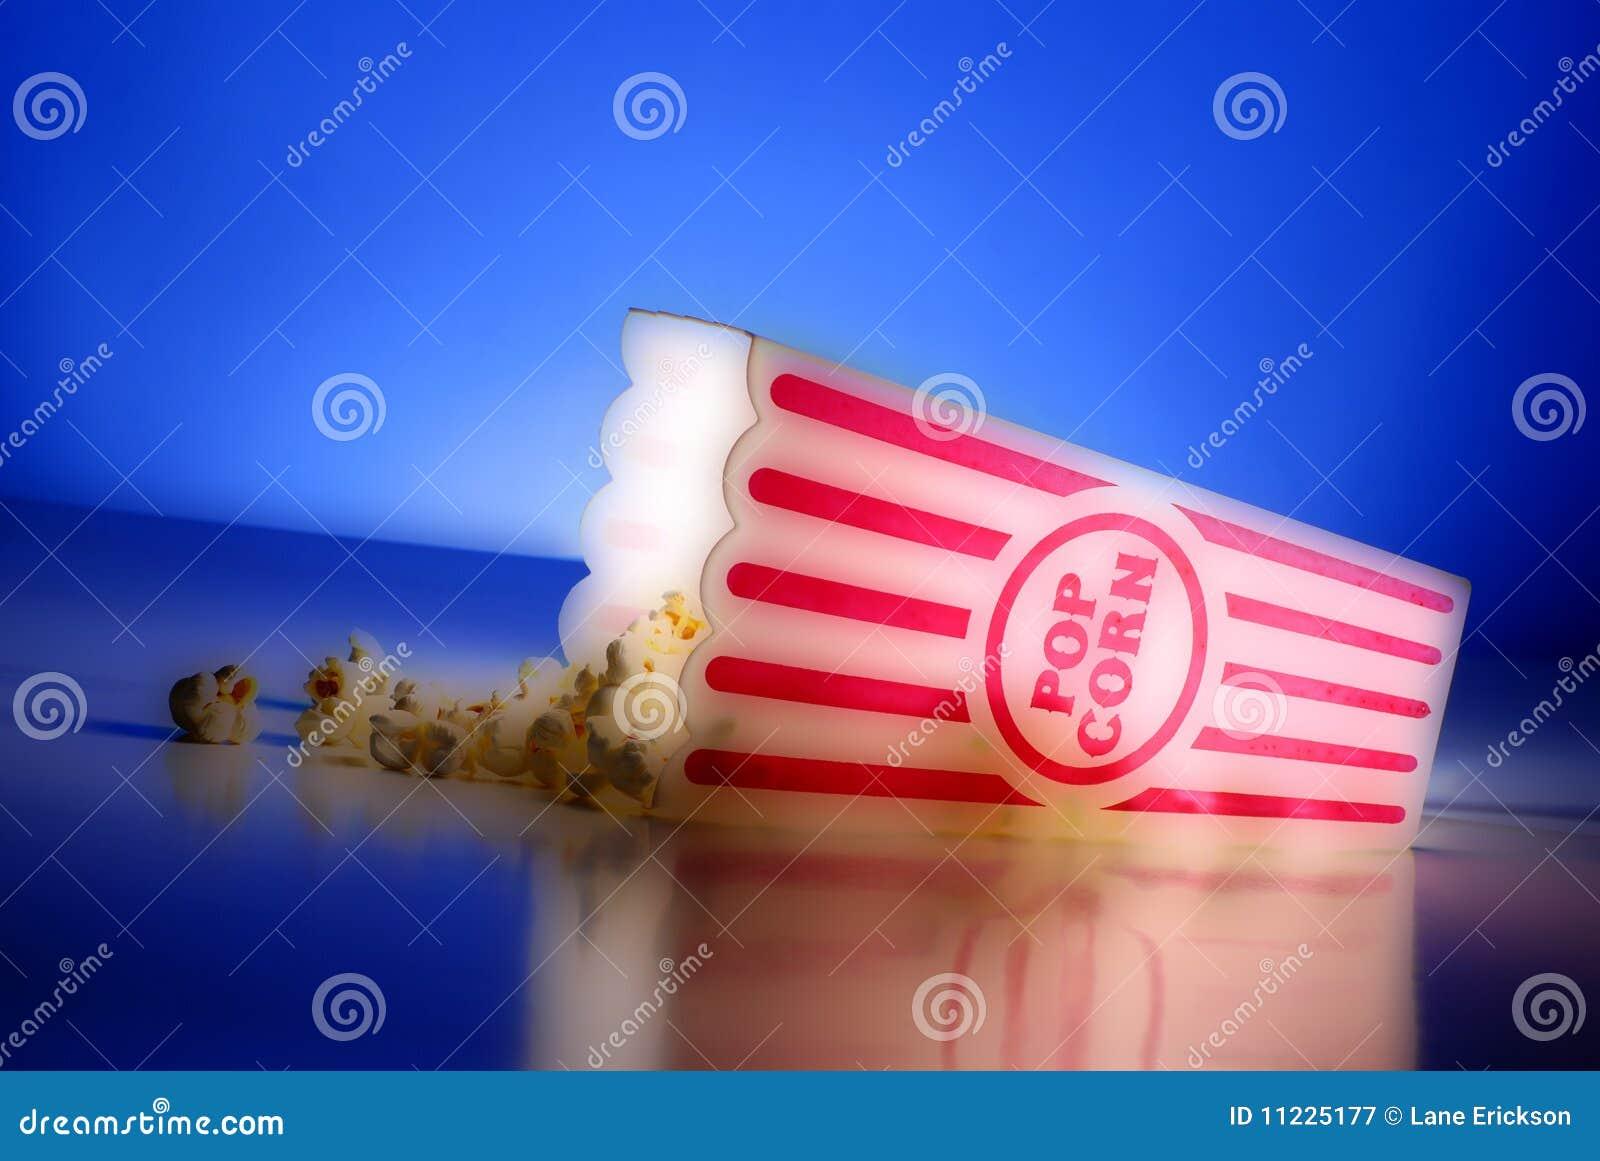 Popcorn ai film